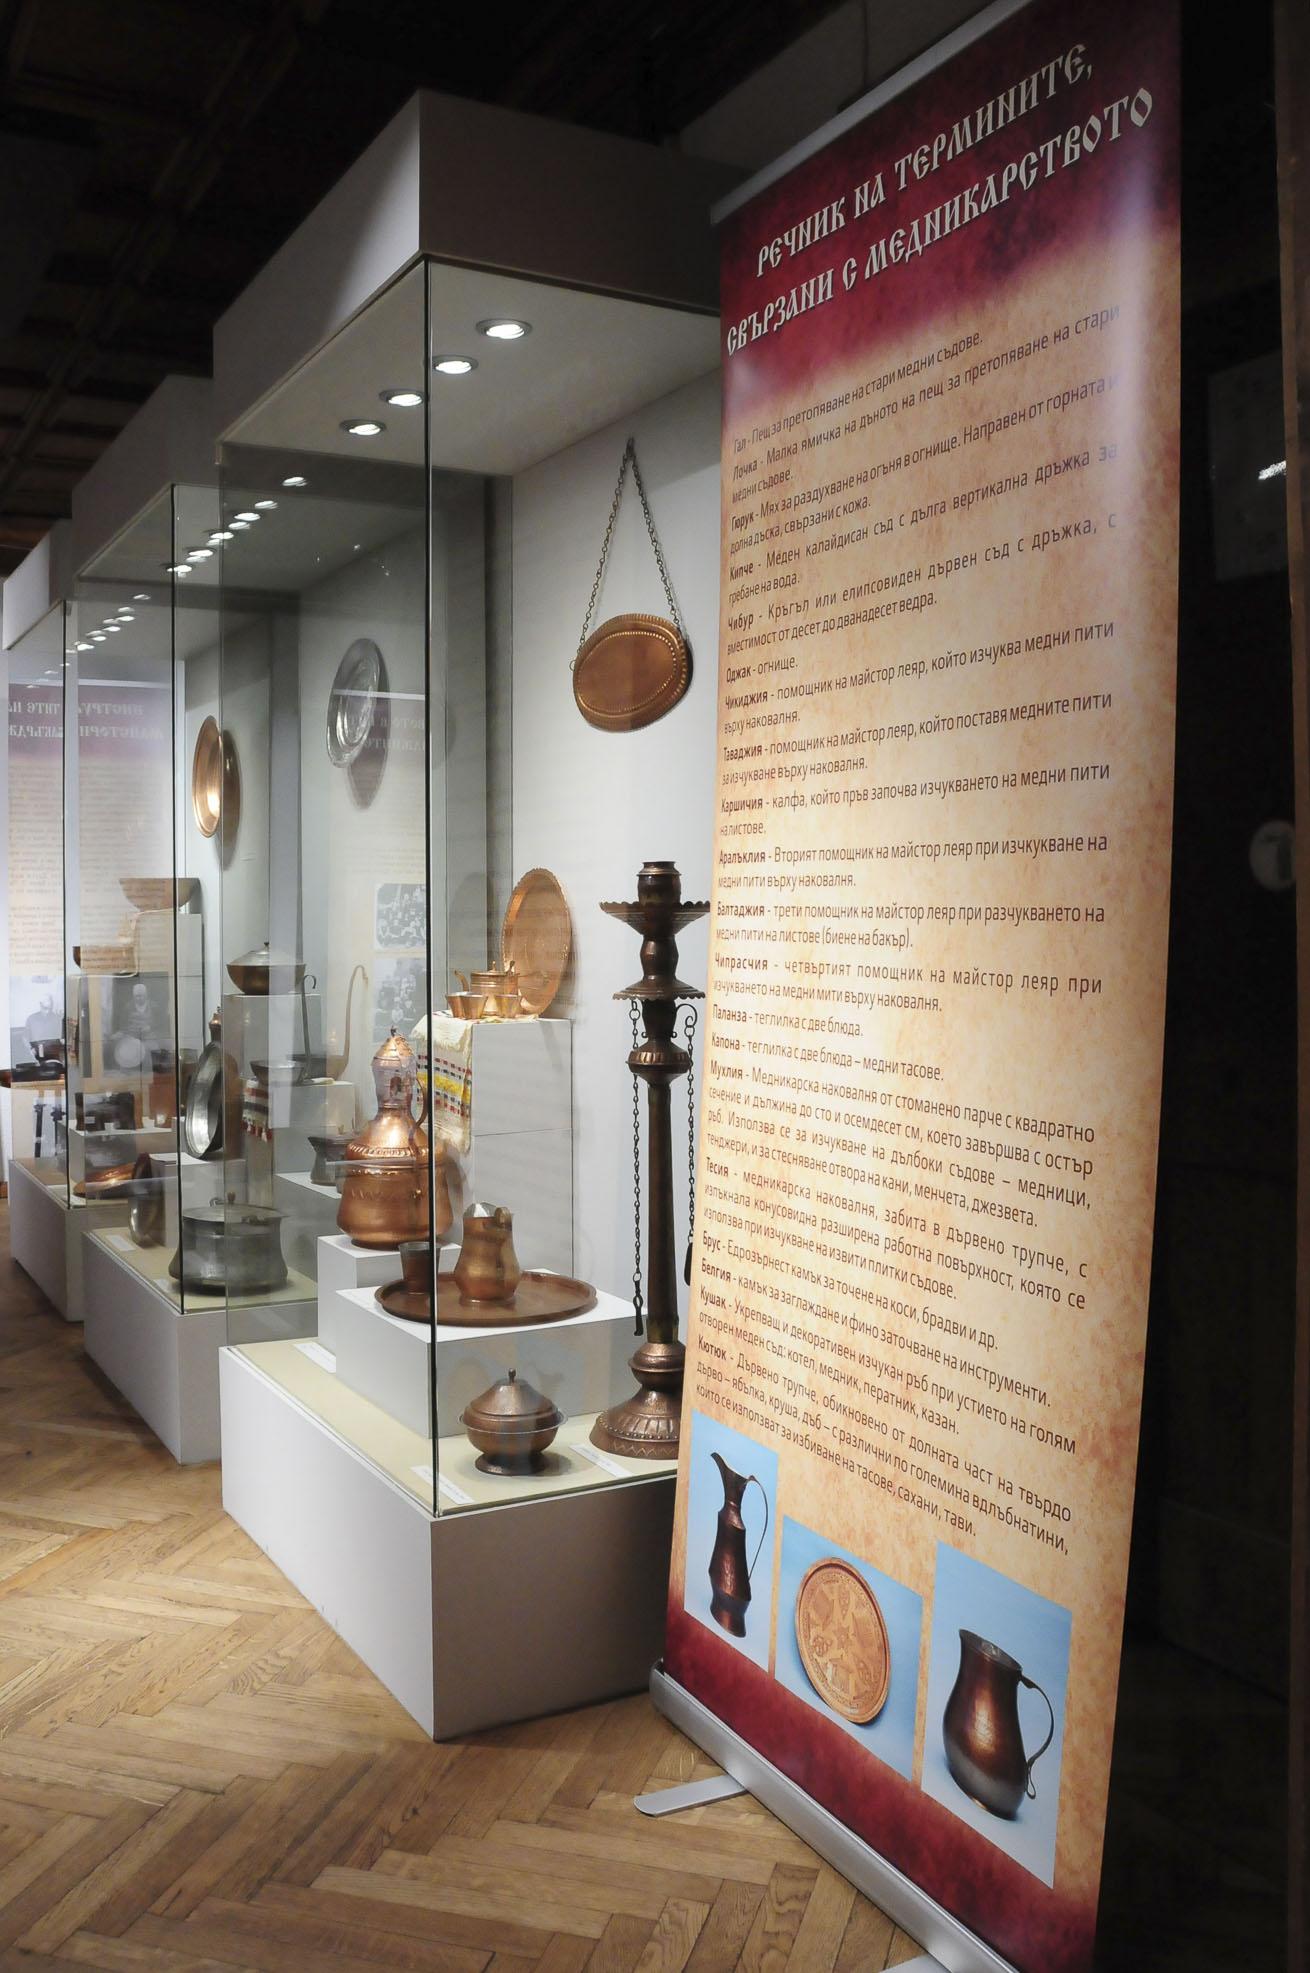 troyan-museum-mednikarstvo-ot-troyanskiq-krai-32